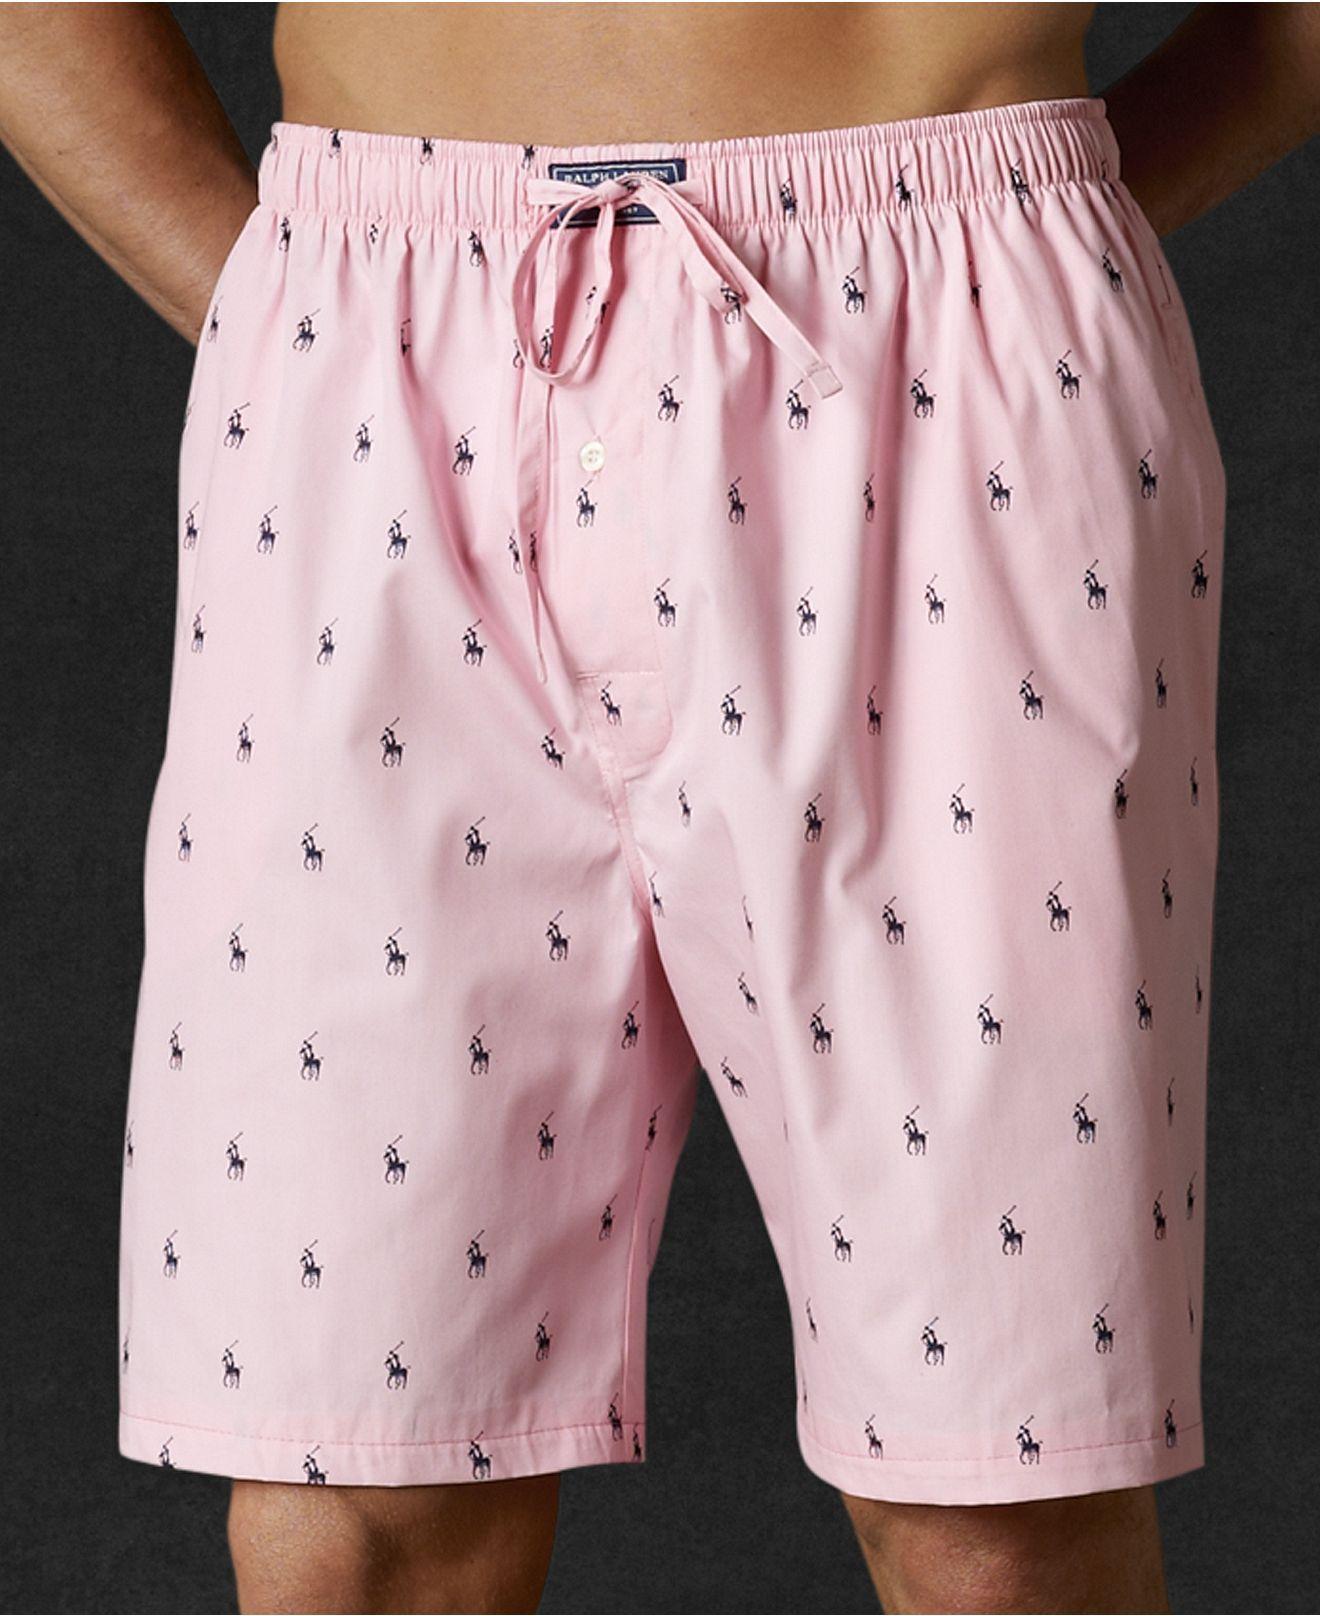 54a4c49fa Polo Ralph Lauren Sleepwear, Polo Player Shorts - Mens Pajamas & Robes -  Macy's